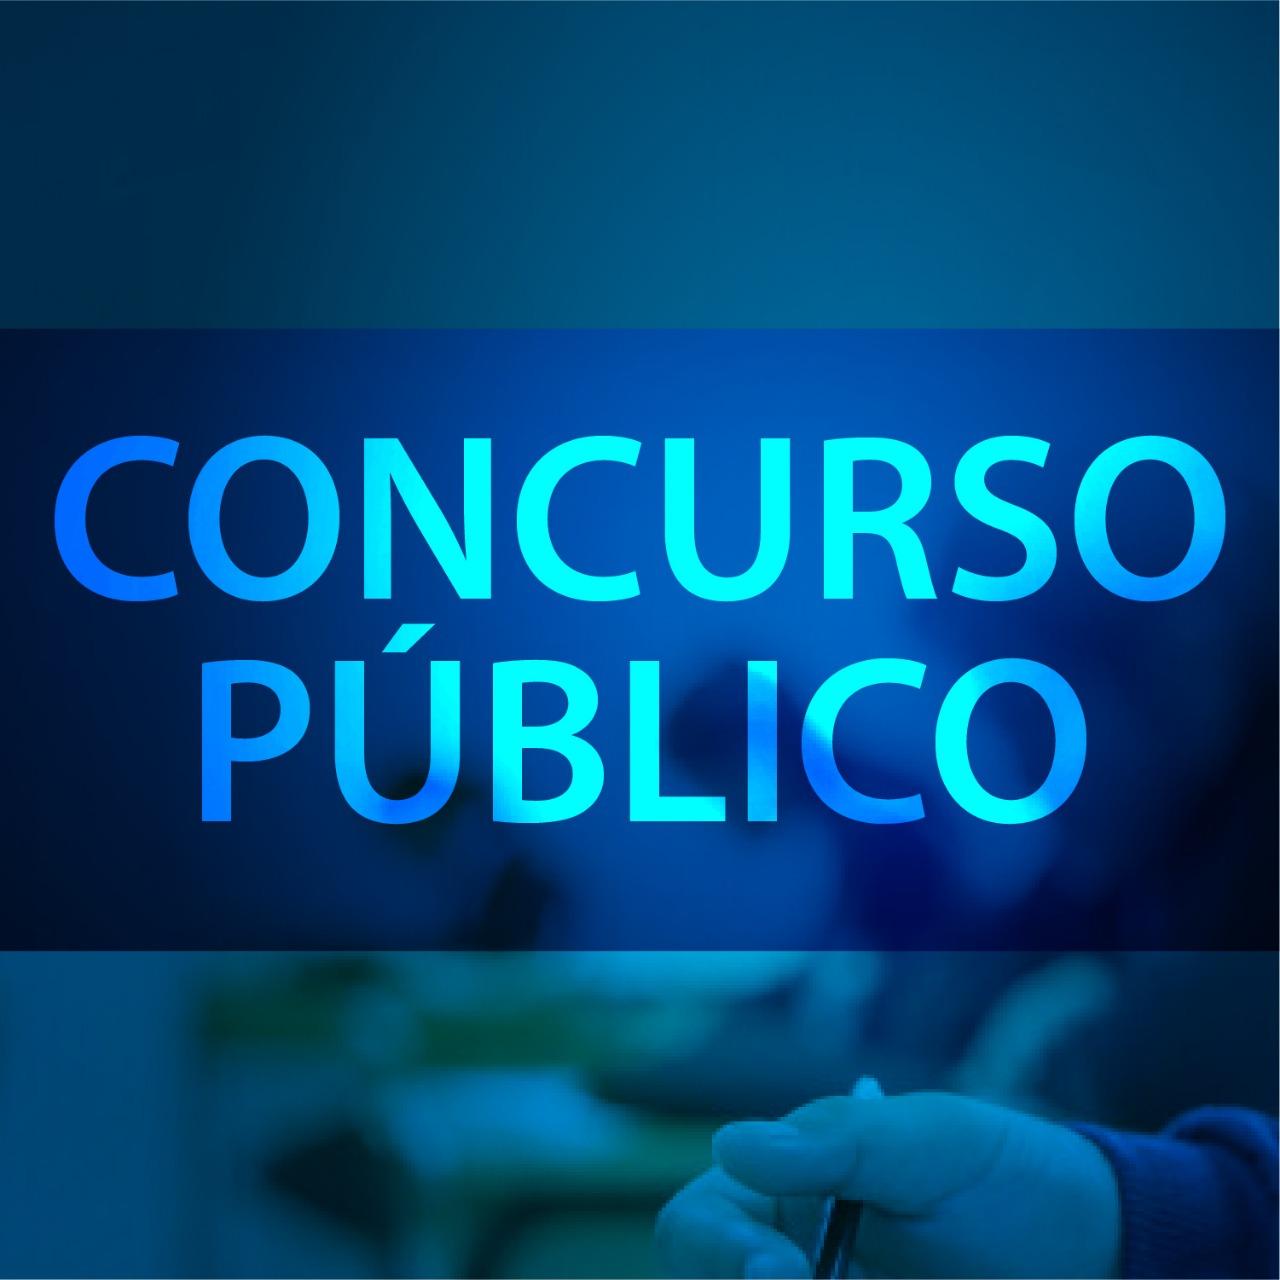 Sai resultado definitivo da prova de títulos para cargos do concurso da Prefeitura de Araguaína